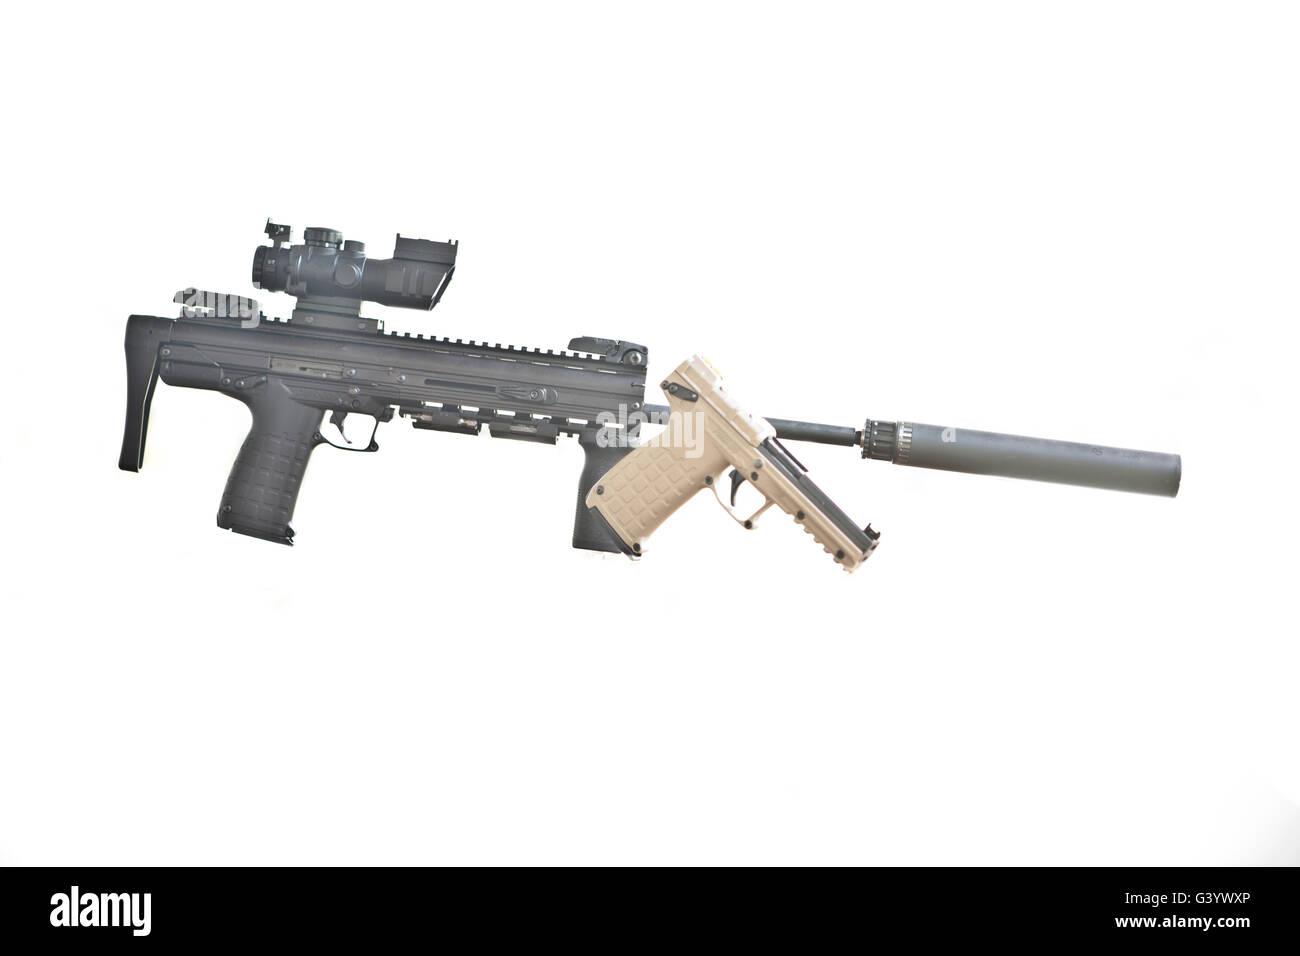 Kel-Tec PMR30 Pistol in front of a Kel-Tec CMR30 Carbine that has a Liberty Suppressor attached - Stock Image